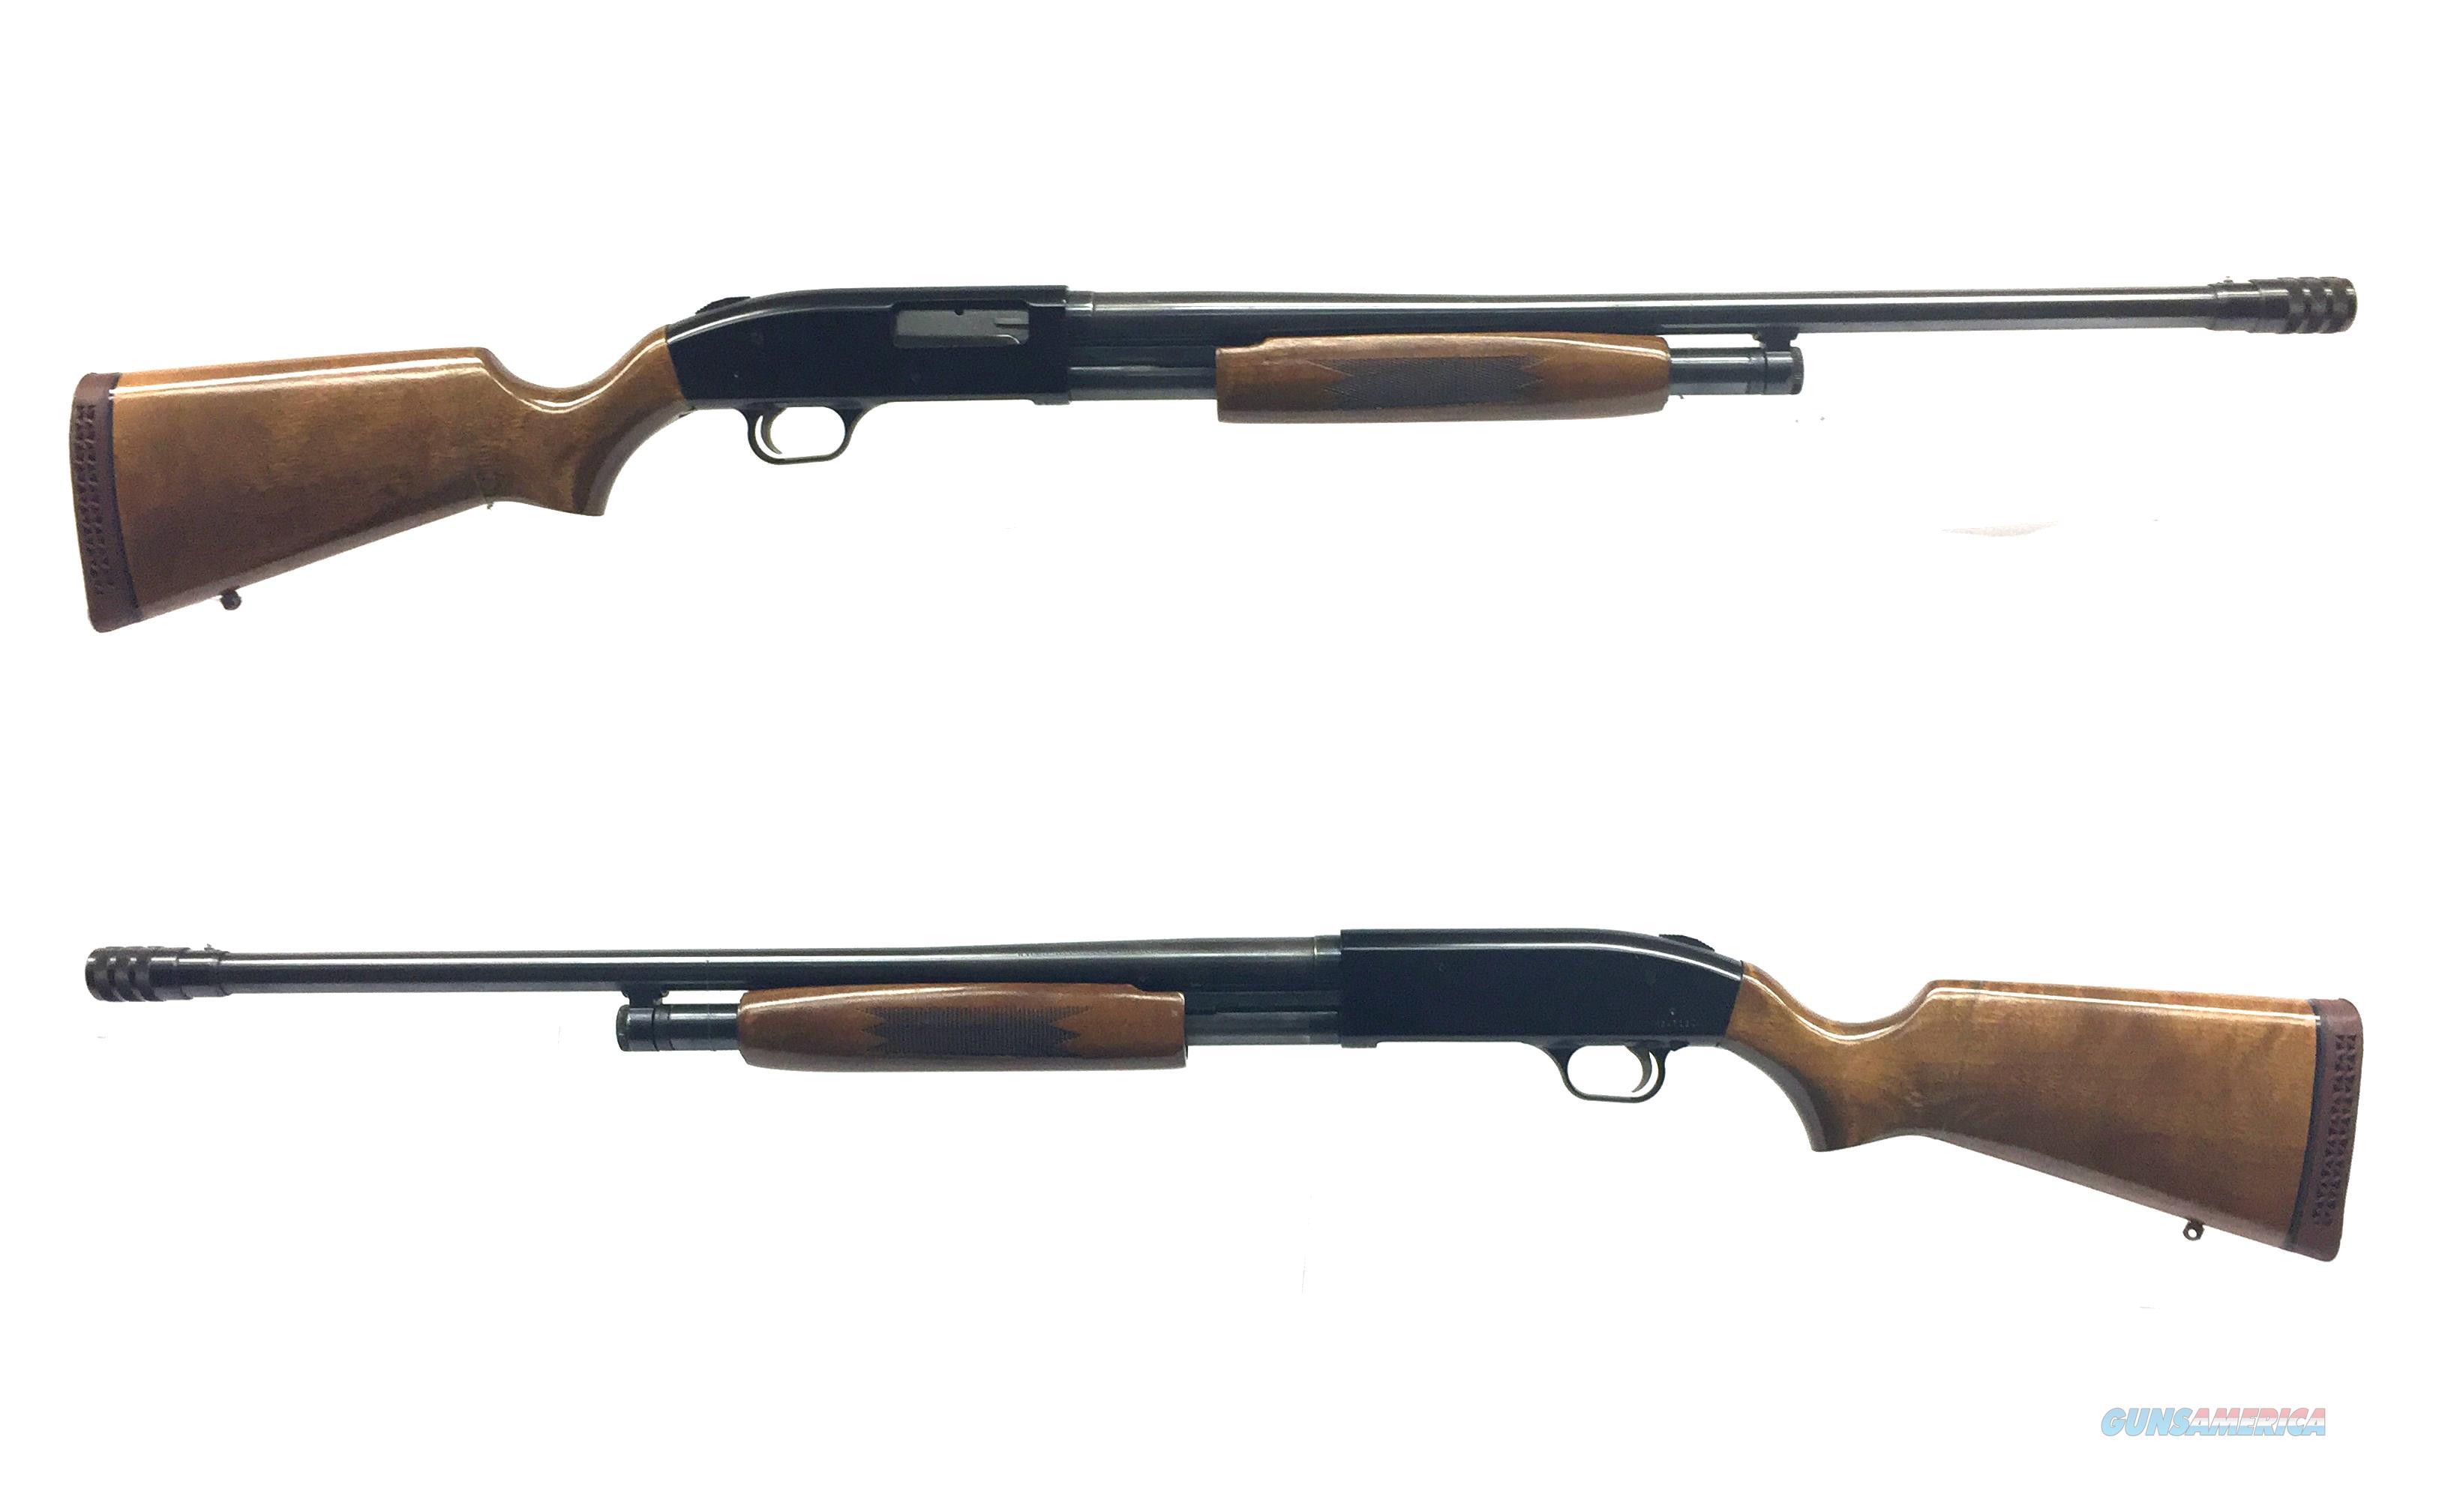 Mossberg 500A 12GA Pump-Action Shotgun  Guns > Shotguns > Mossberg Shotguns > Pump > Sporting